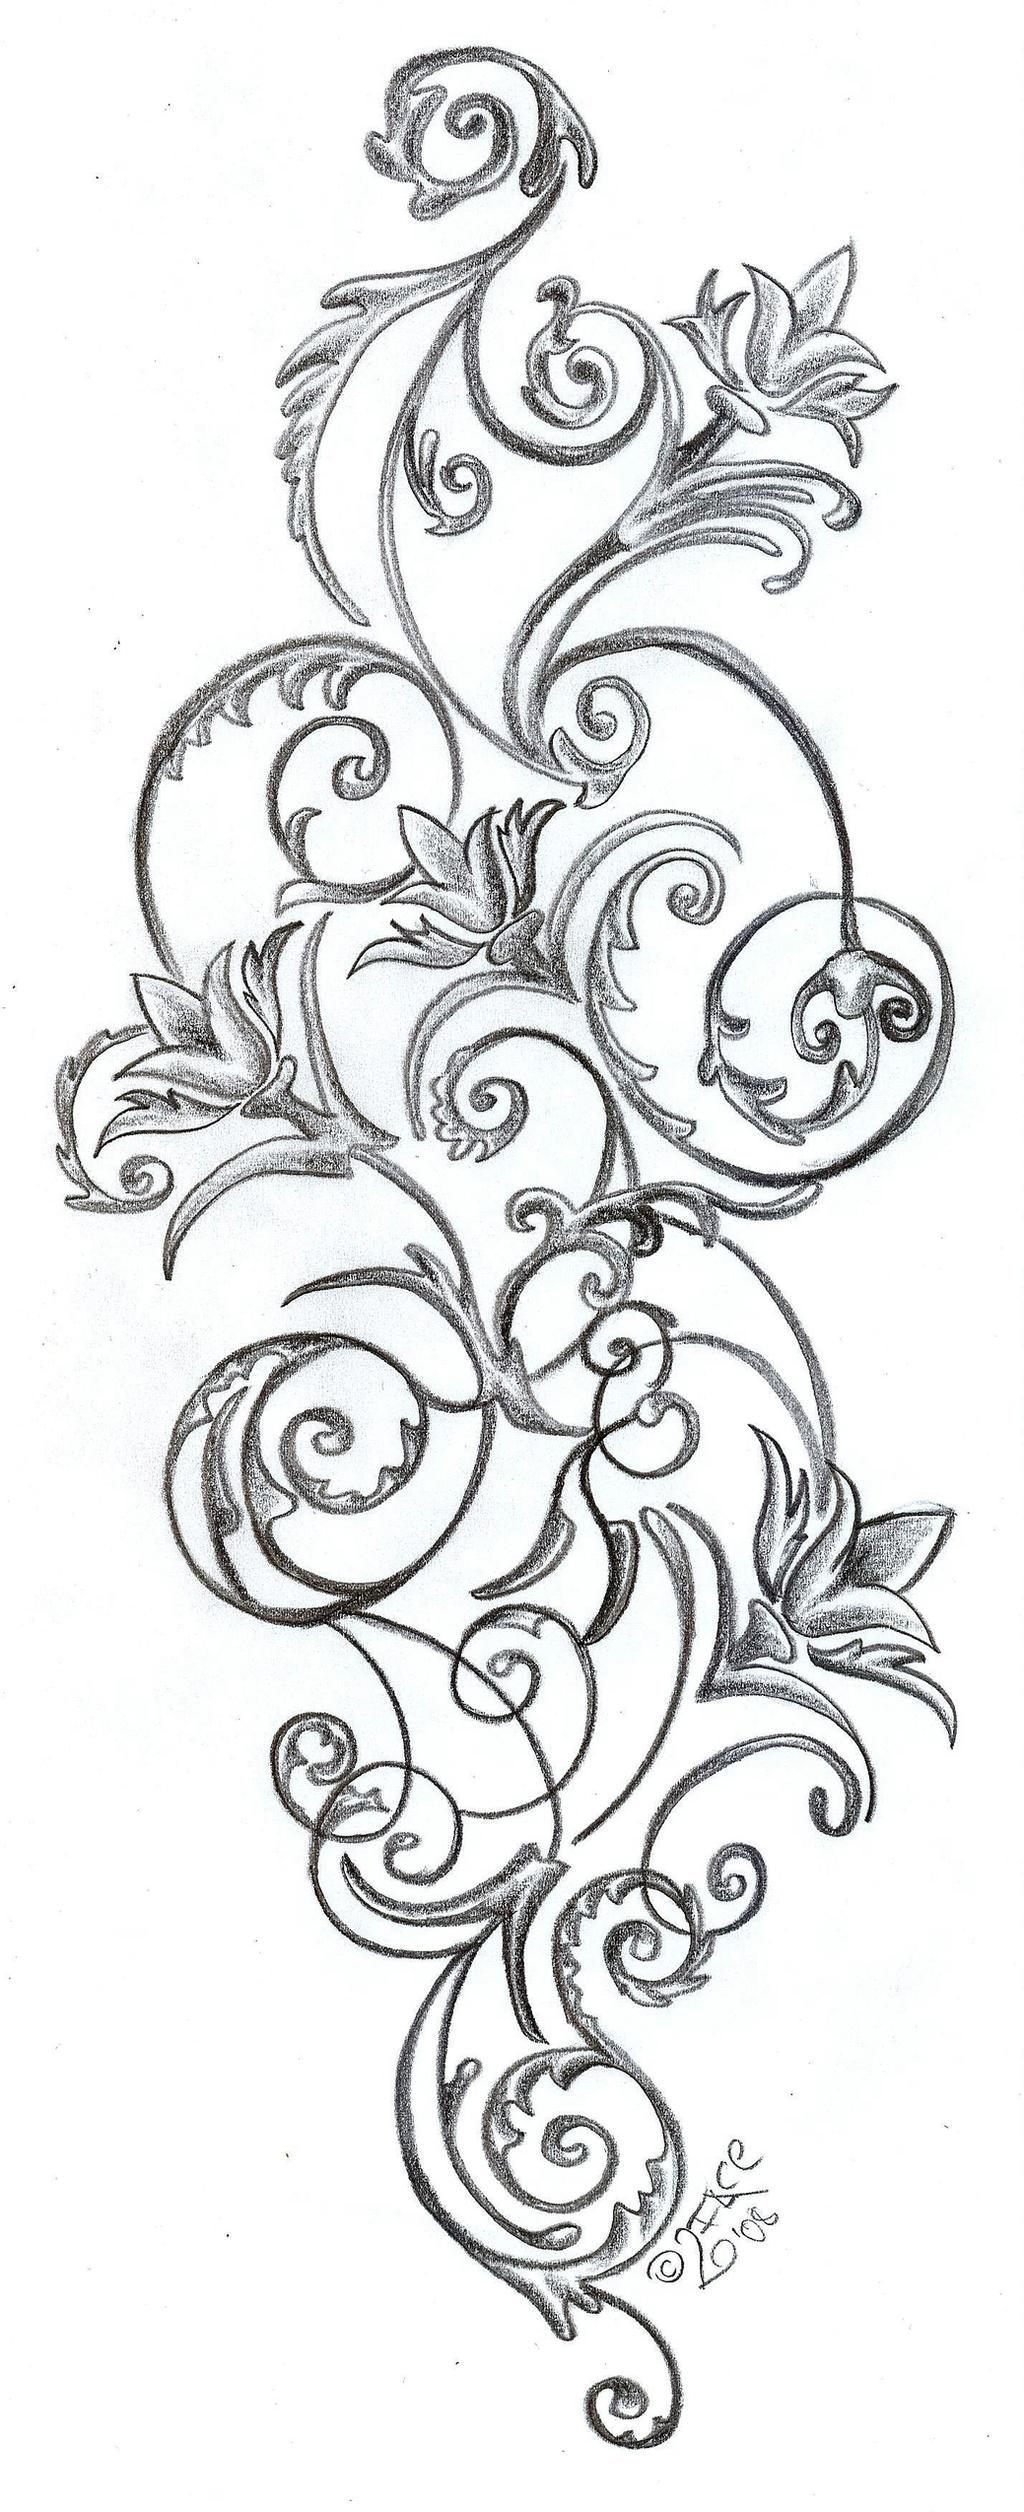 Art Nouveau Flower Tattoo: Flowers Ornamentation Design By 2Face-Tattoo On DeviantArt